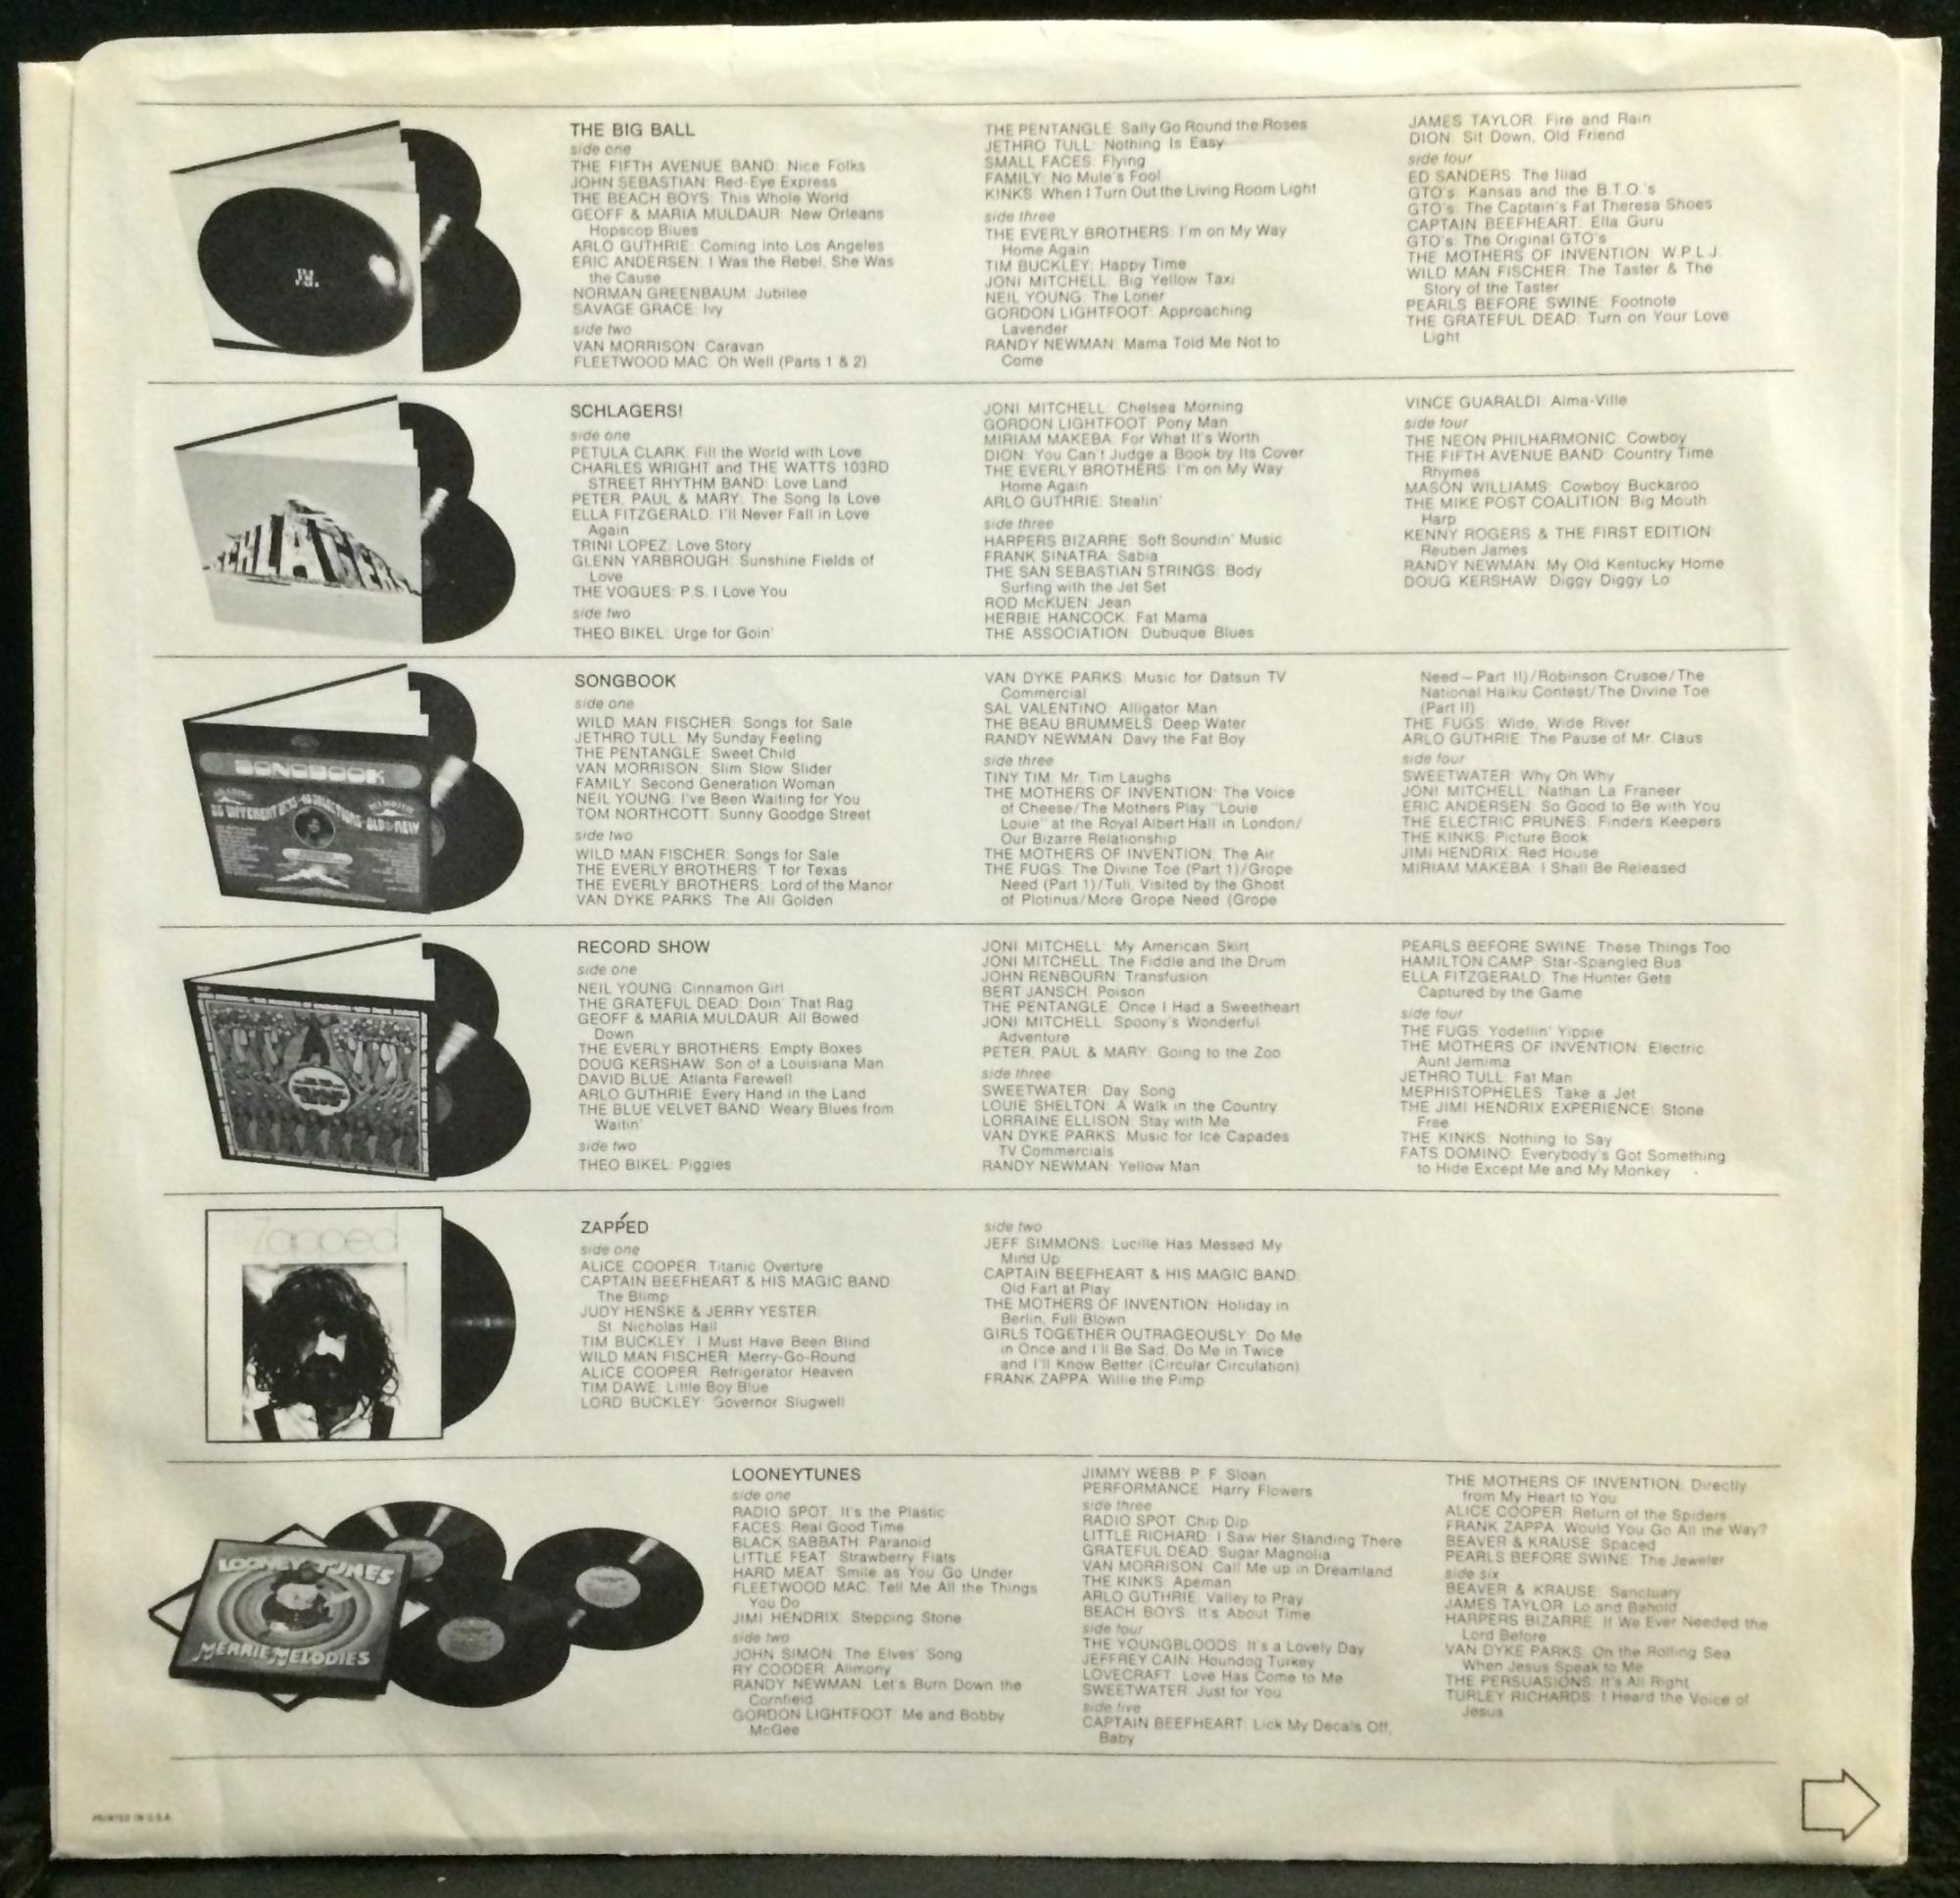 Astral weeks by Van Morrison, LP with shugarecords